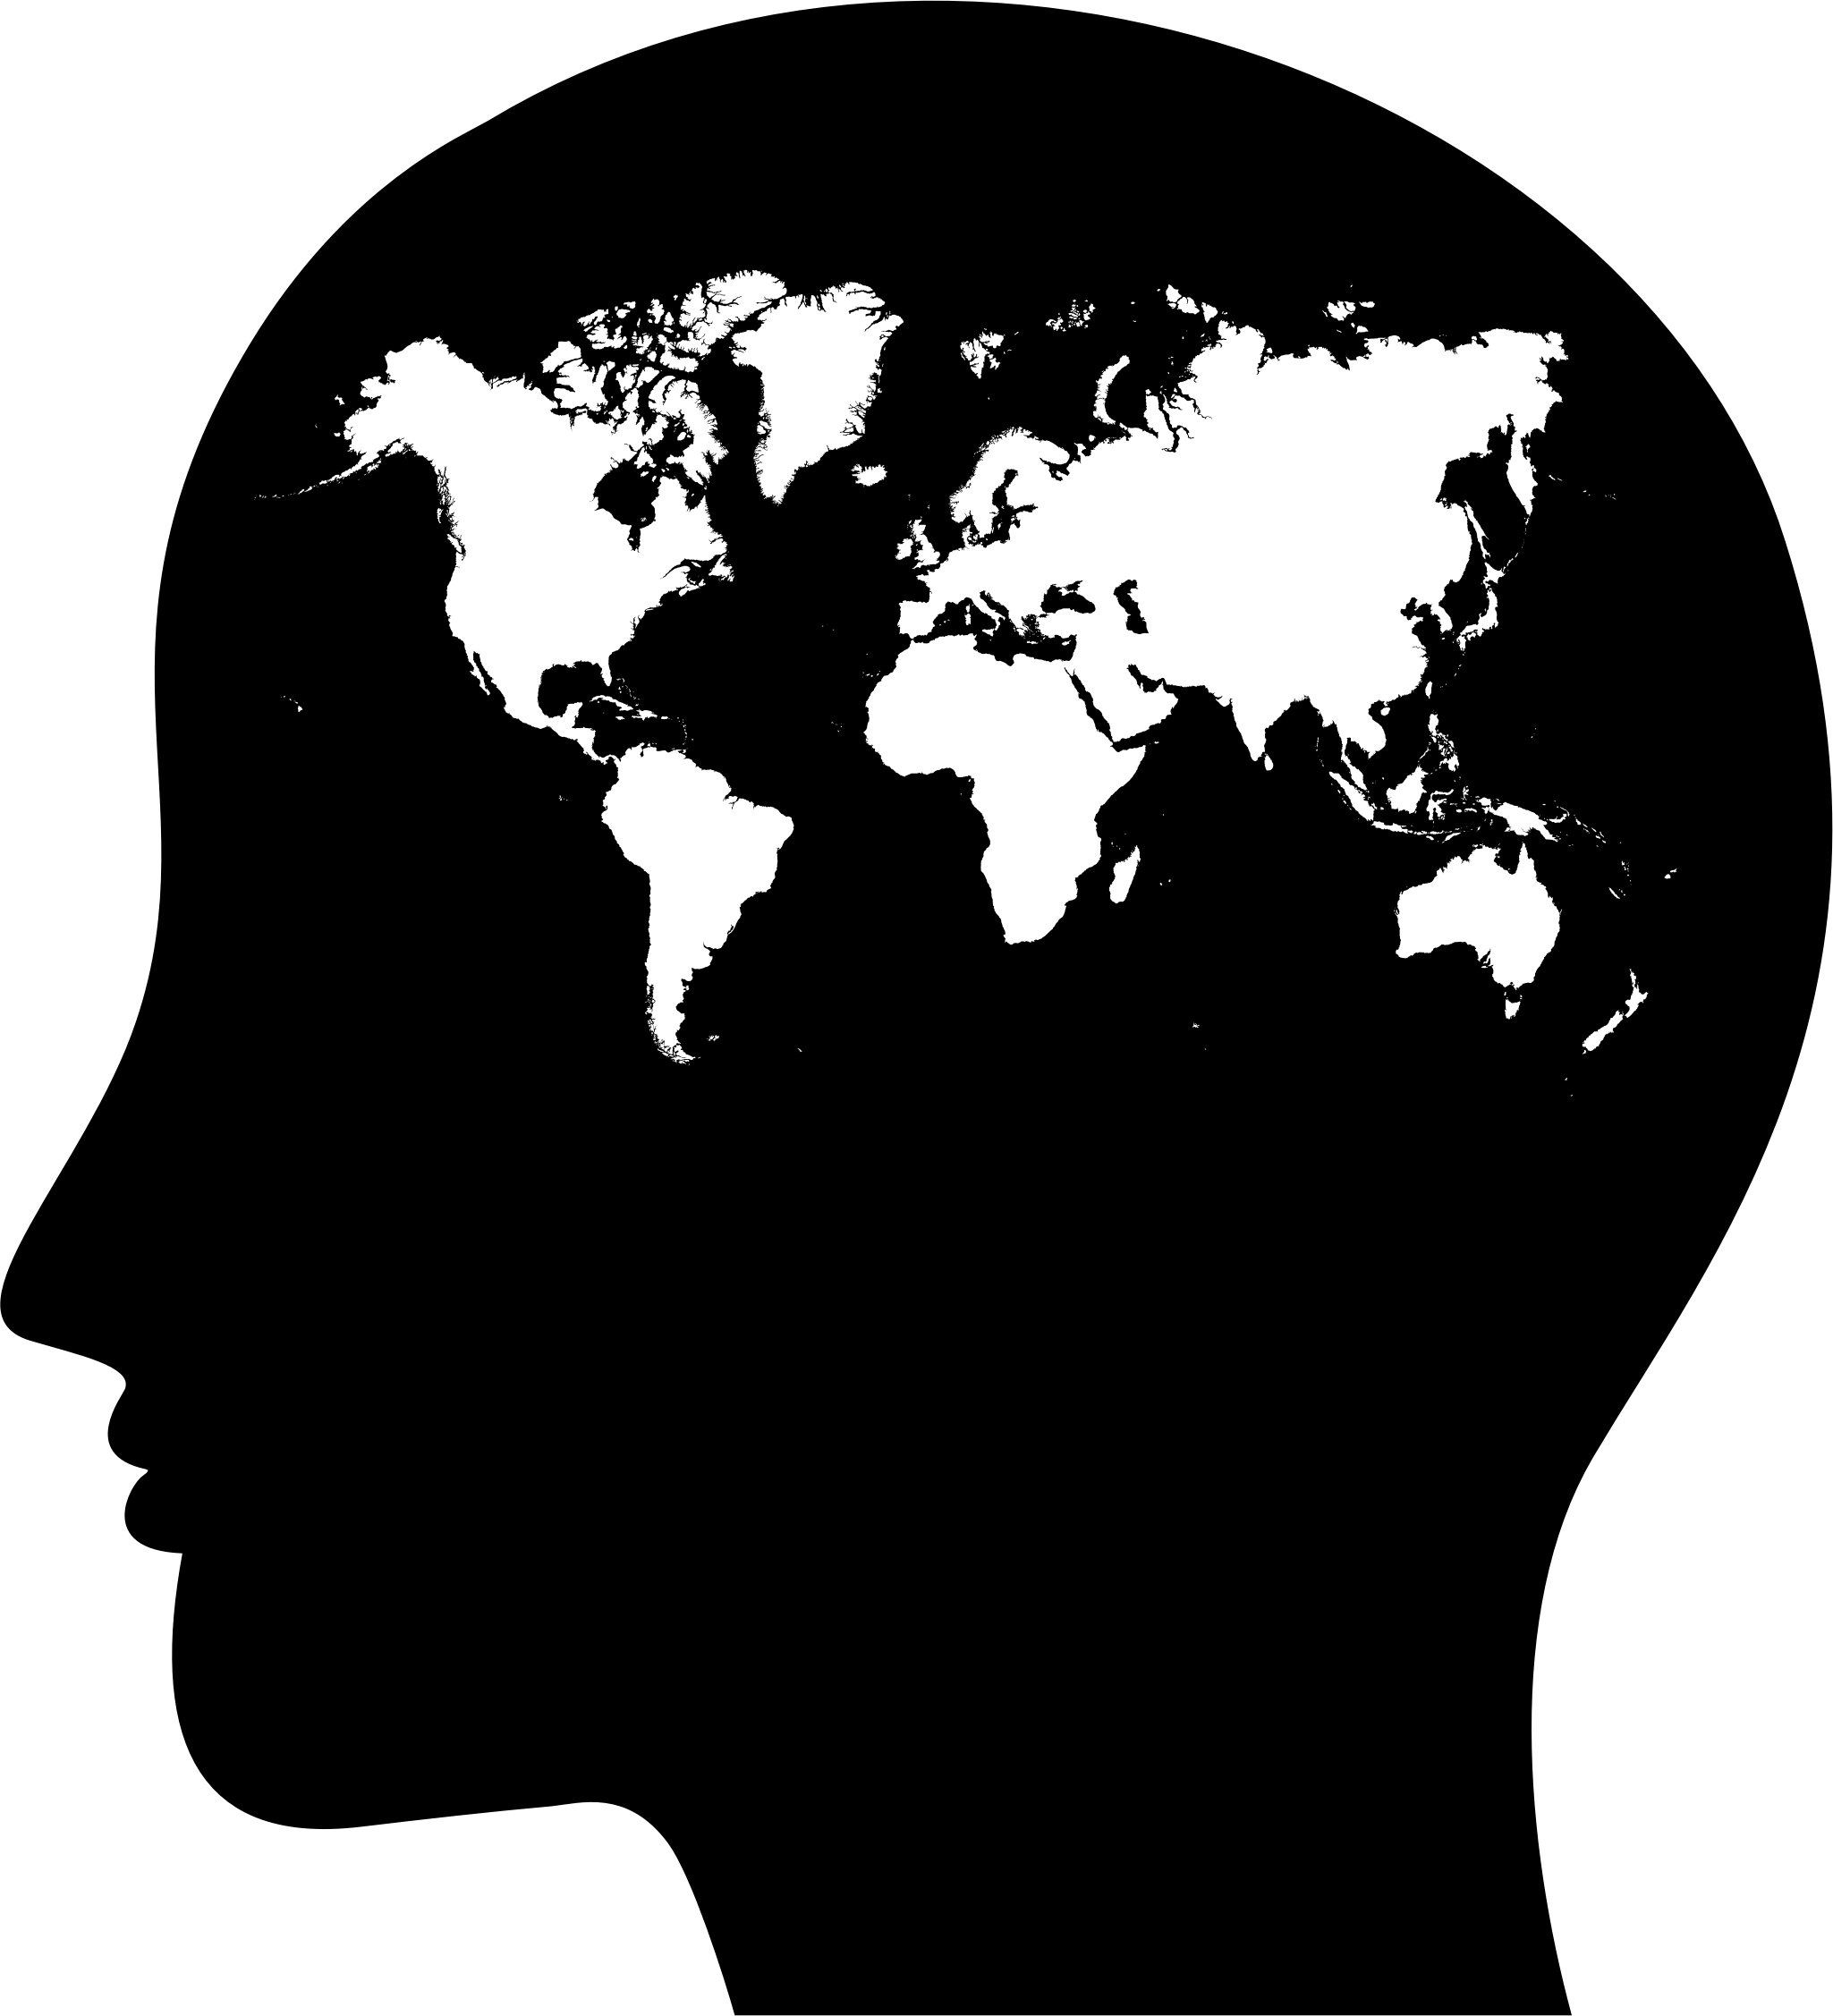 clip library library Female head profile map. World clipart silhouette